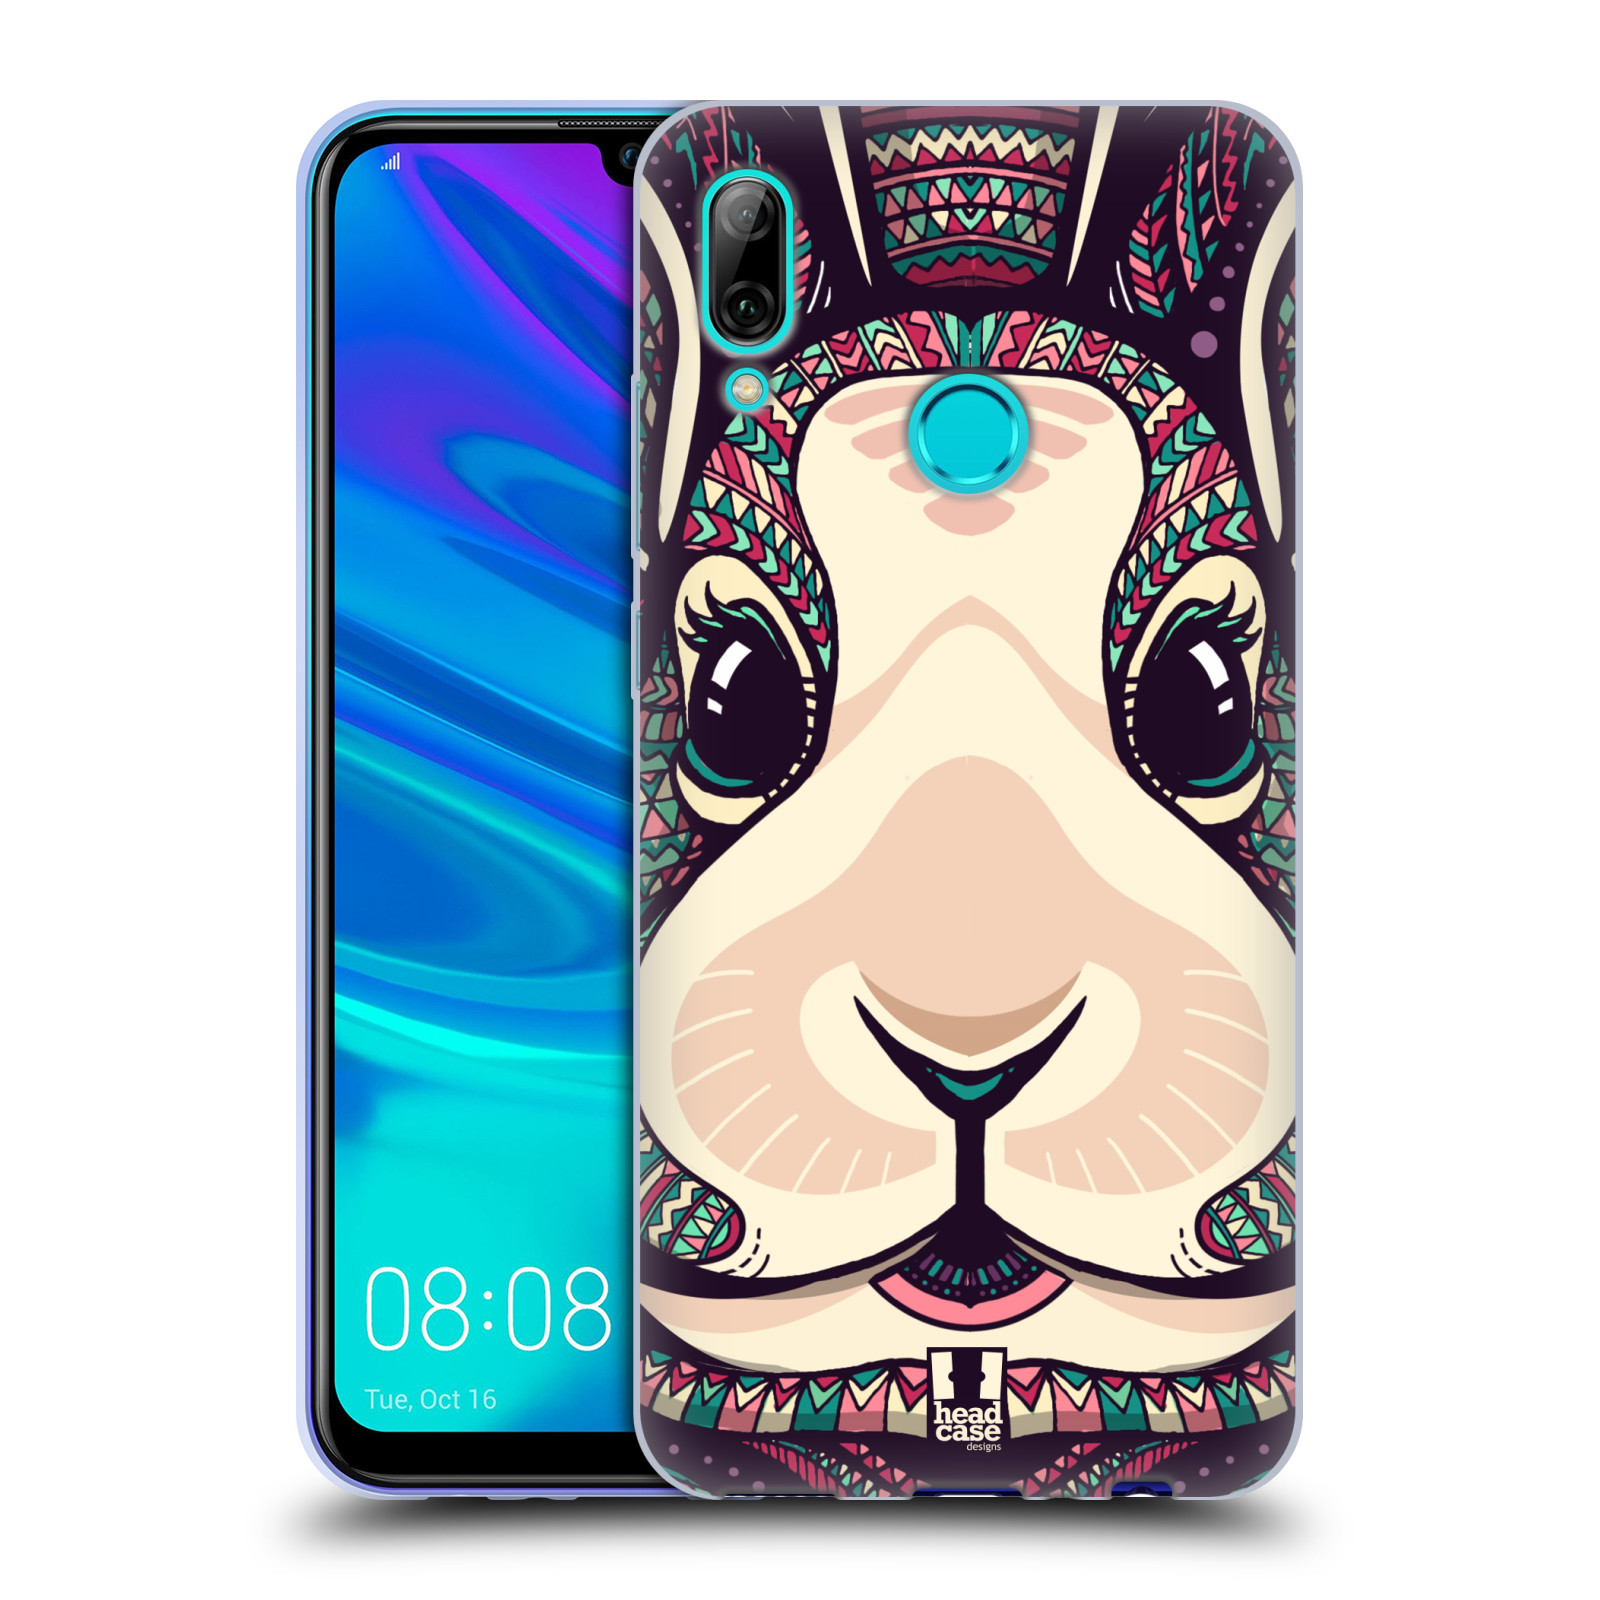 Silikonové pouzdro na mobil Huawei P Smart (2019) - Head Case - AZTEC ZAJÍČEK